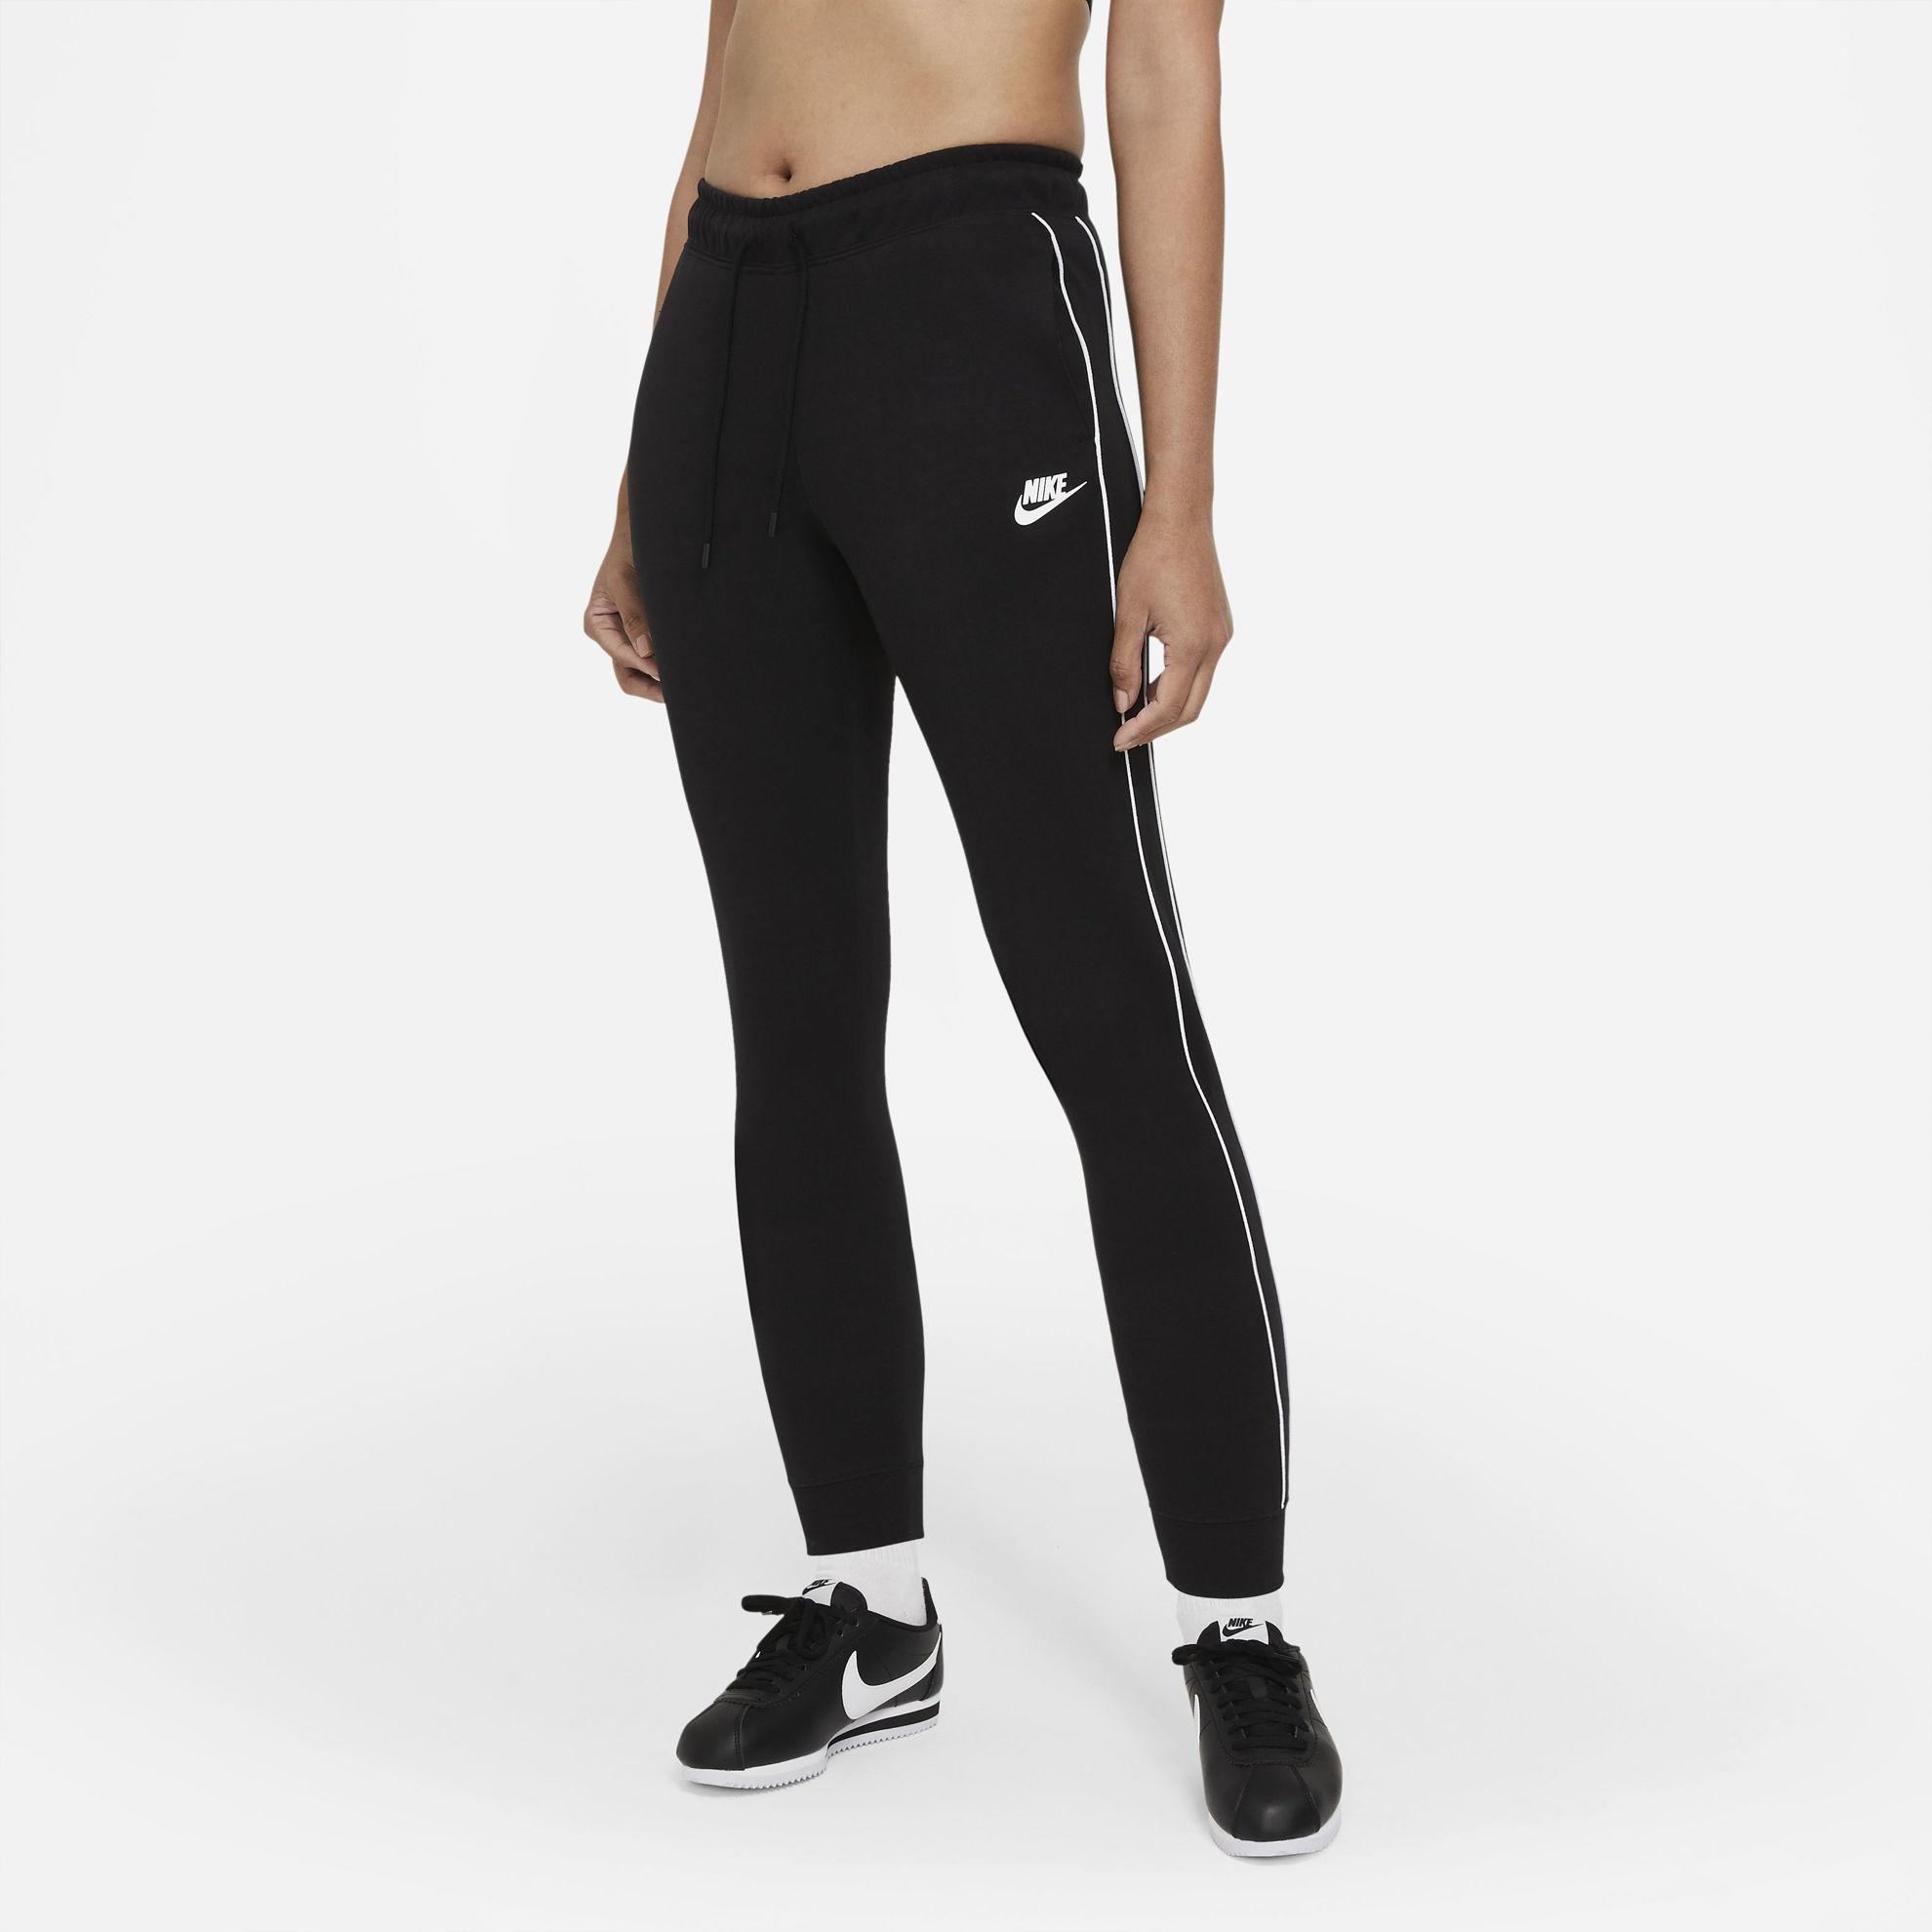 Bilde av Nike  W NSW MLNM ESSNTL FLC MR JGGR CZ8340-010